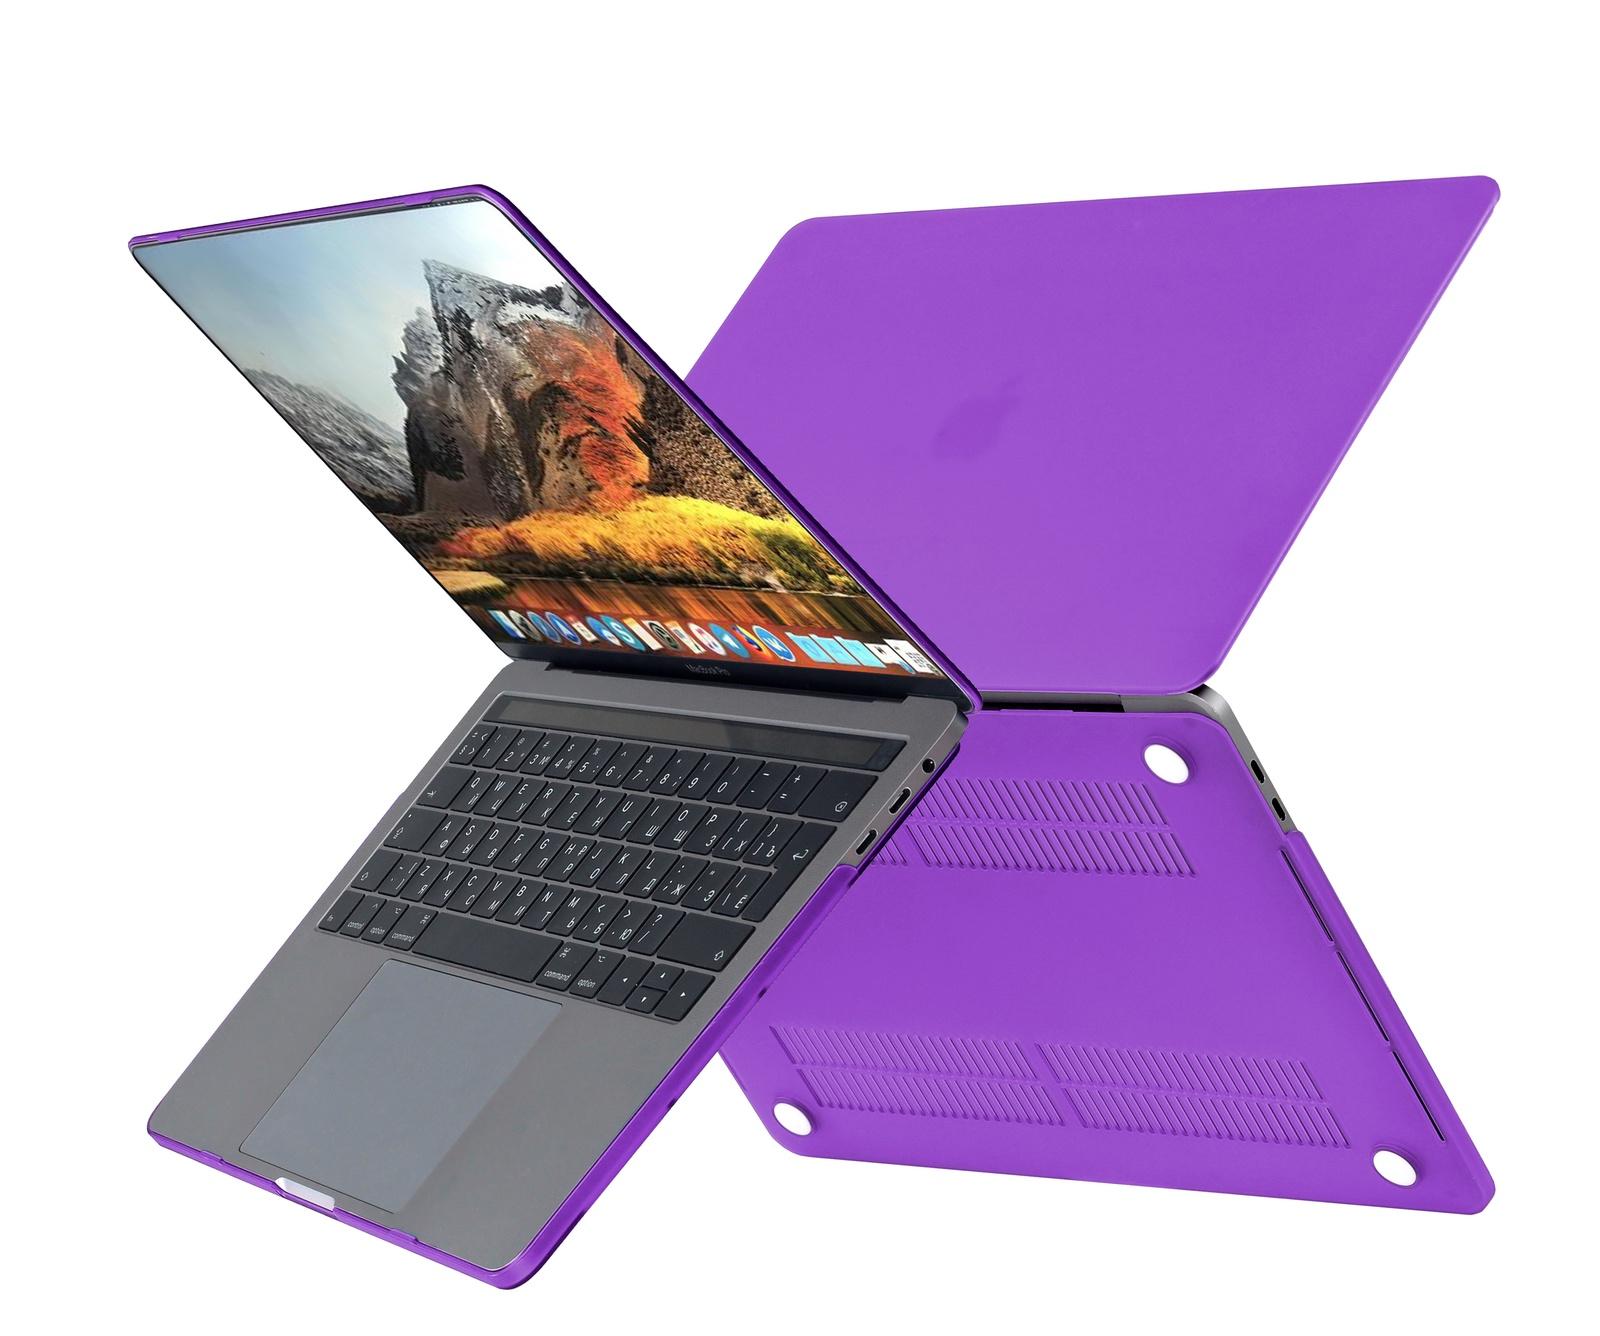 цена на Чехол HardShell Case для Macbook Pro 15 Retina, сиреневый